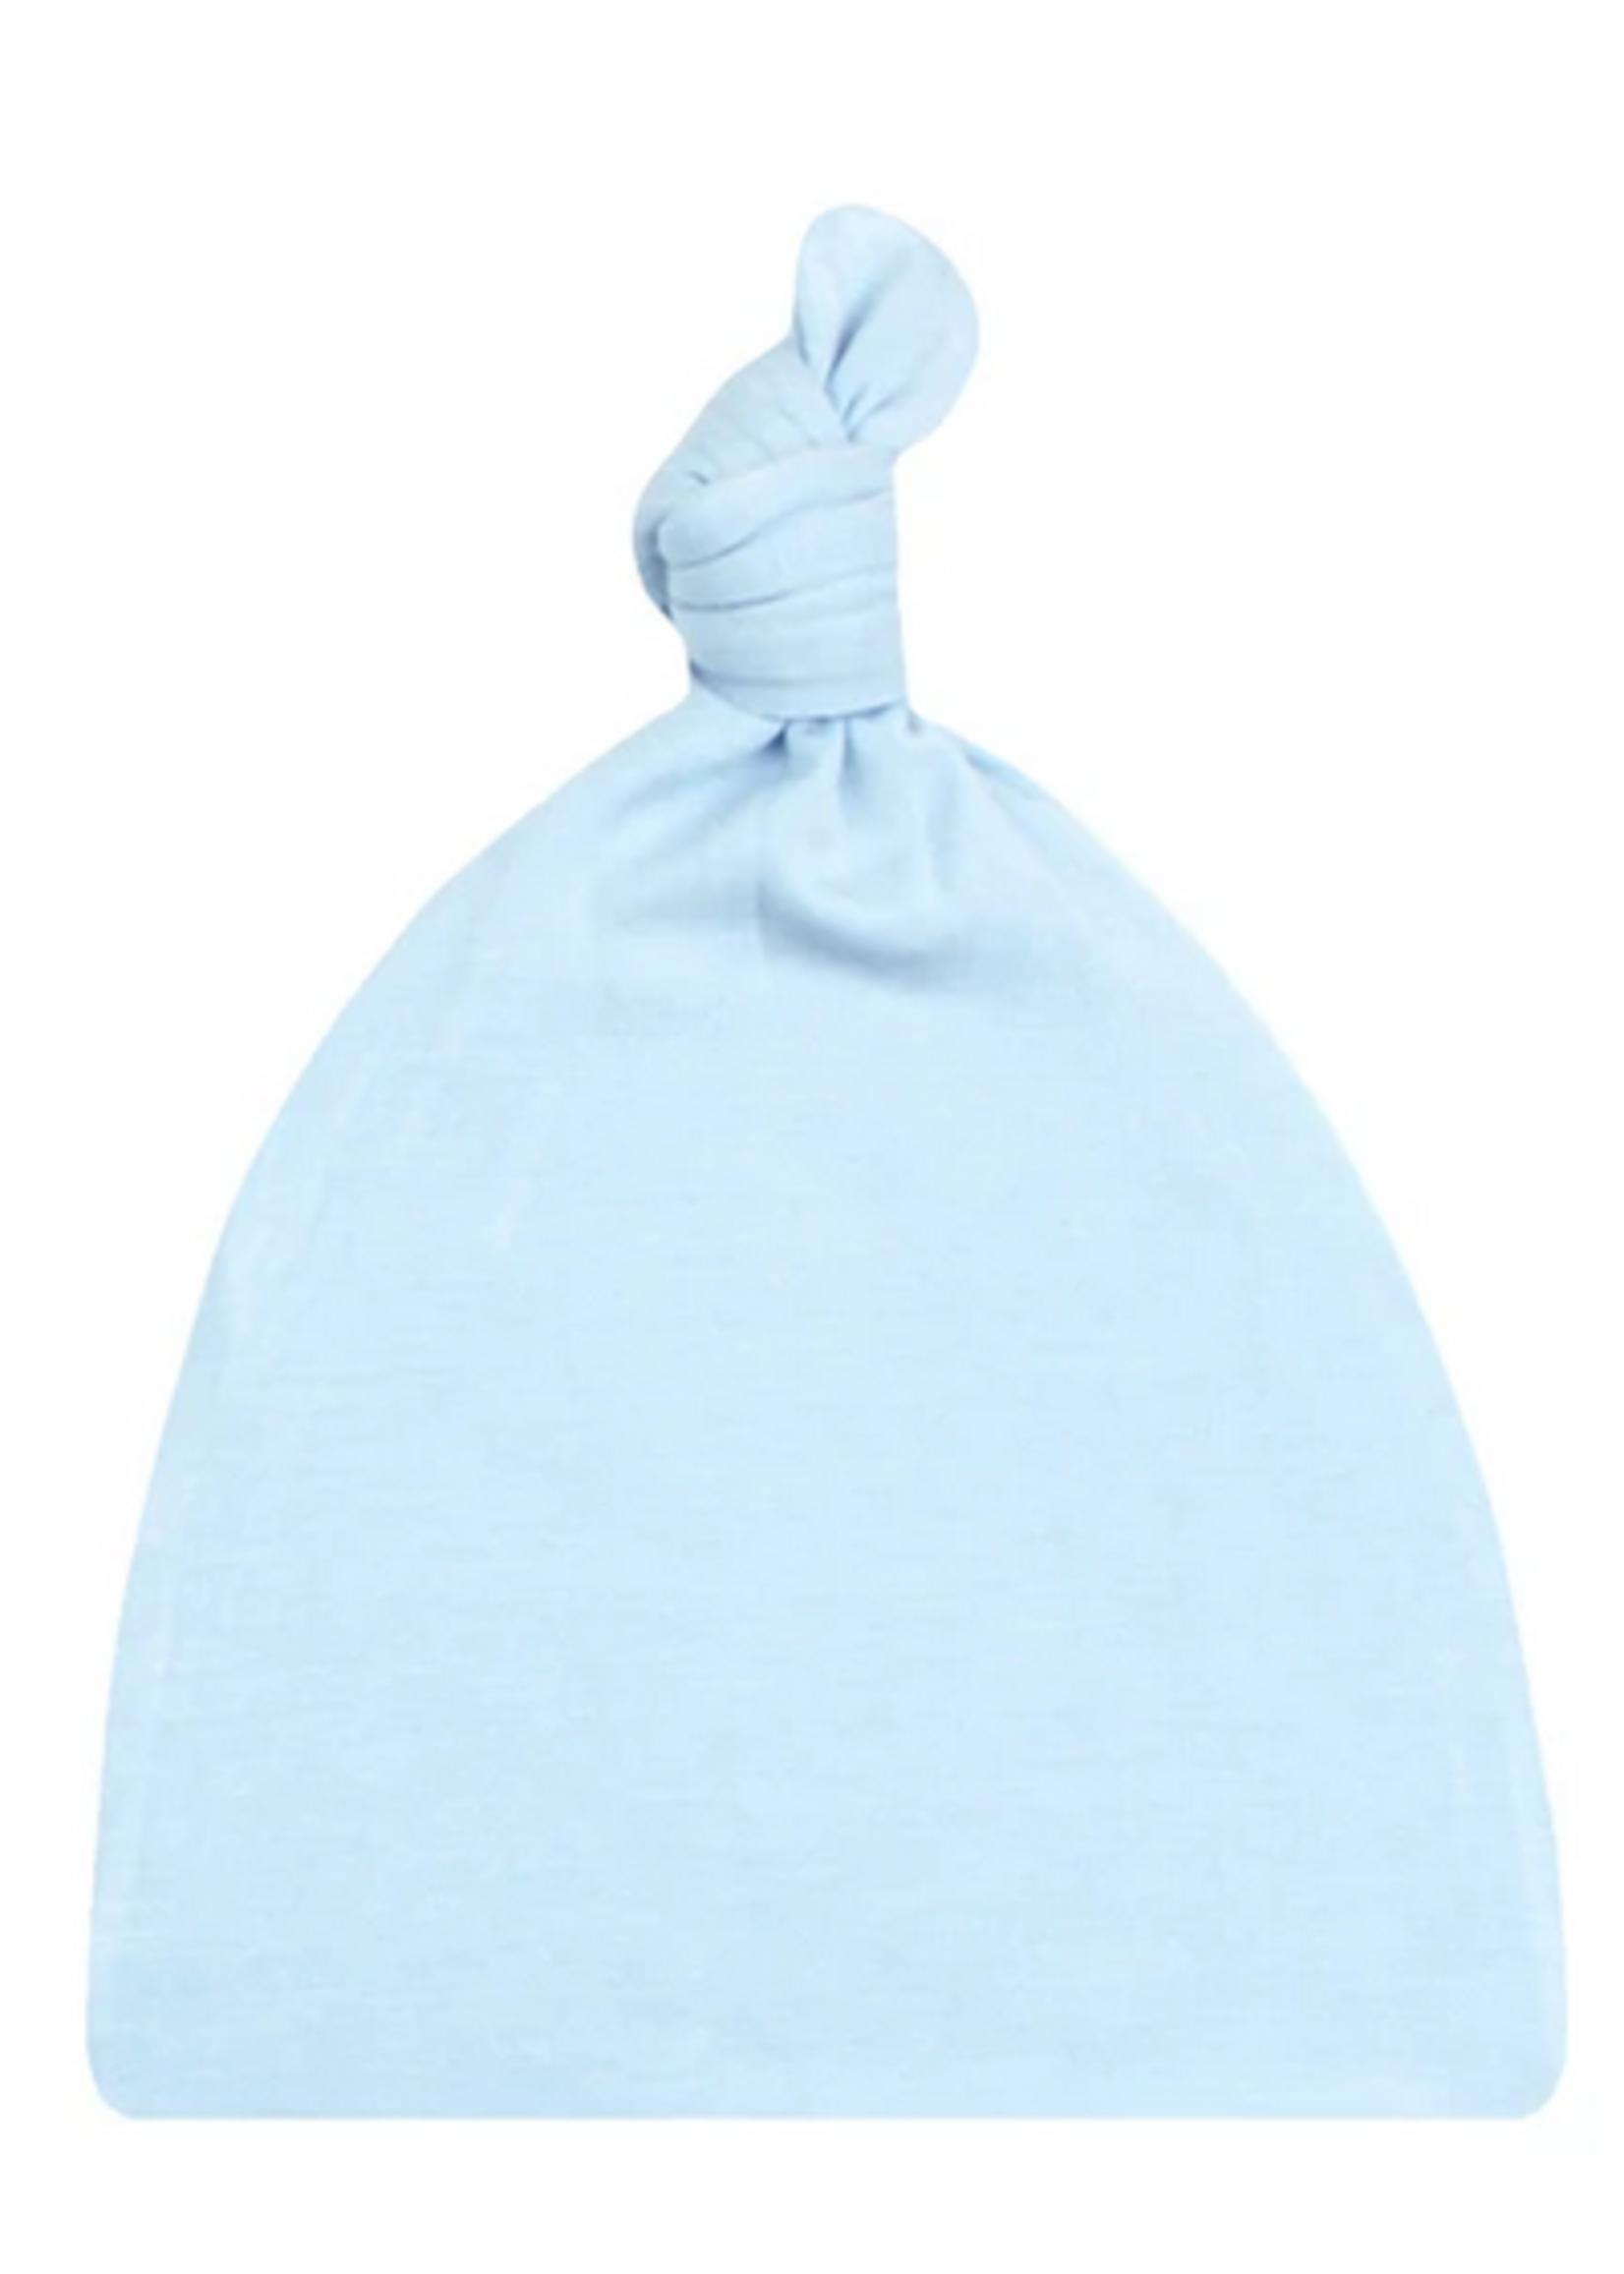 Elitaire Petite Jude Baby Blue Newborn Bundle (Hat)